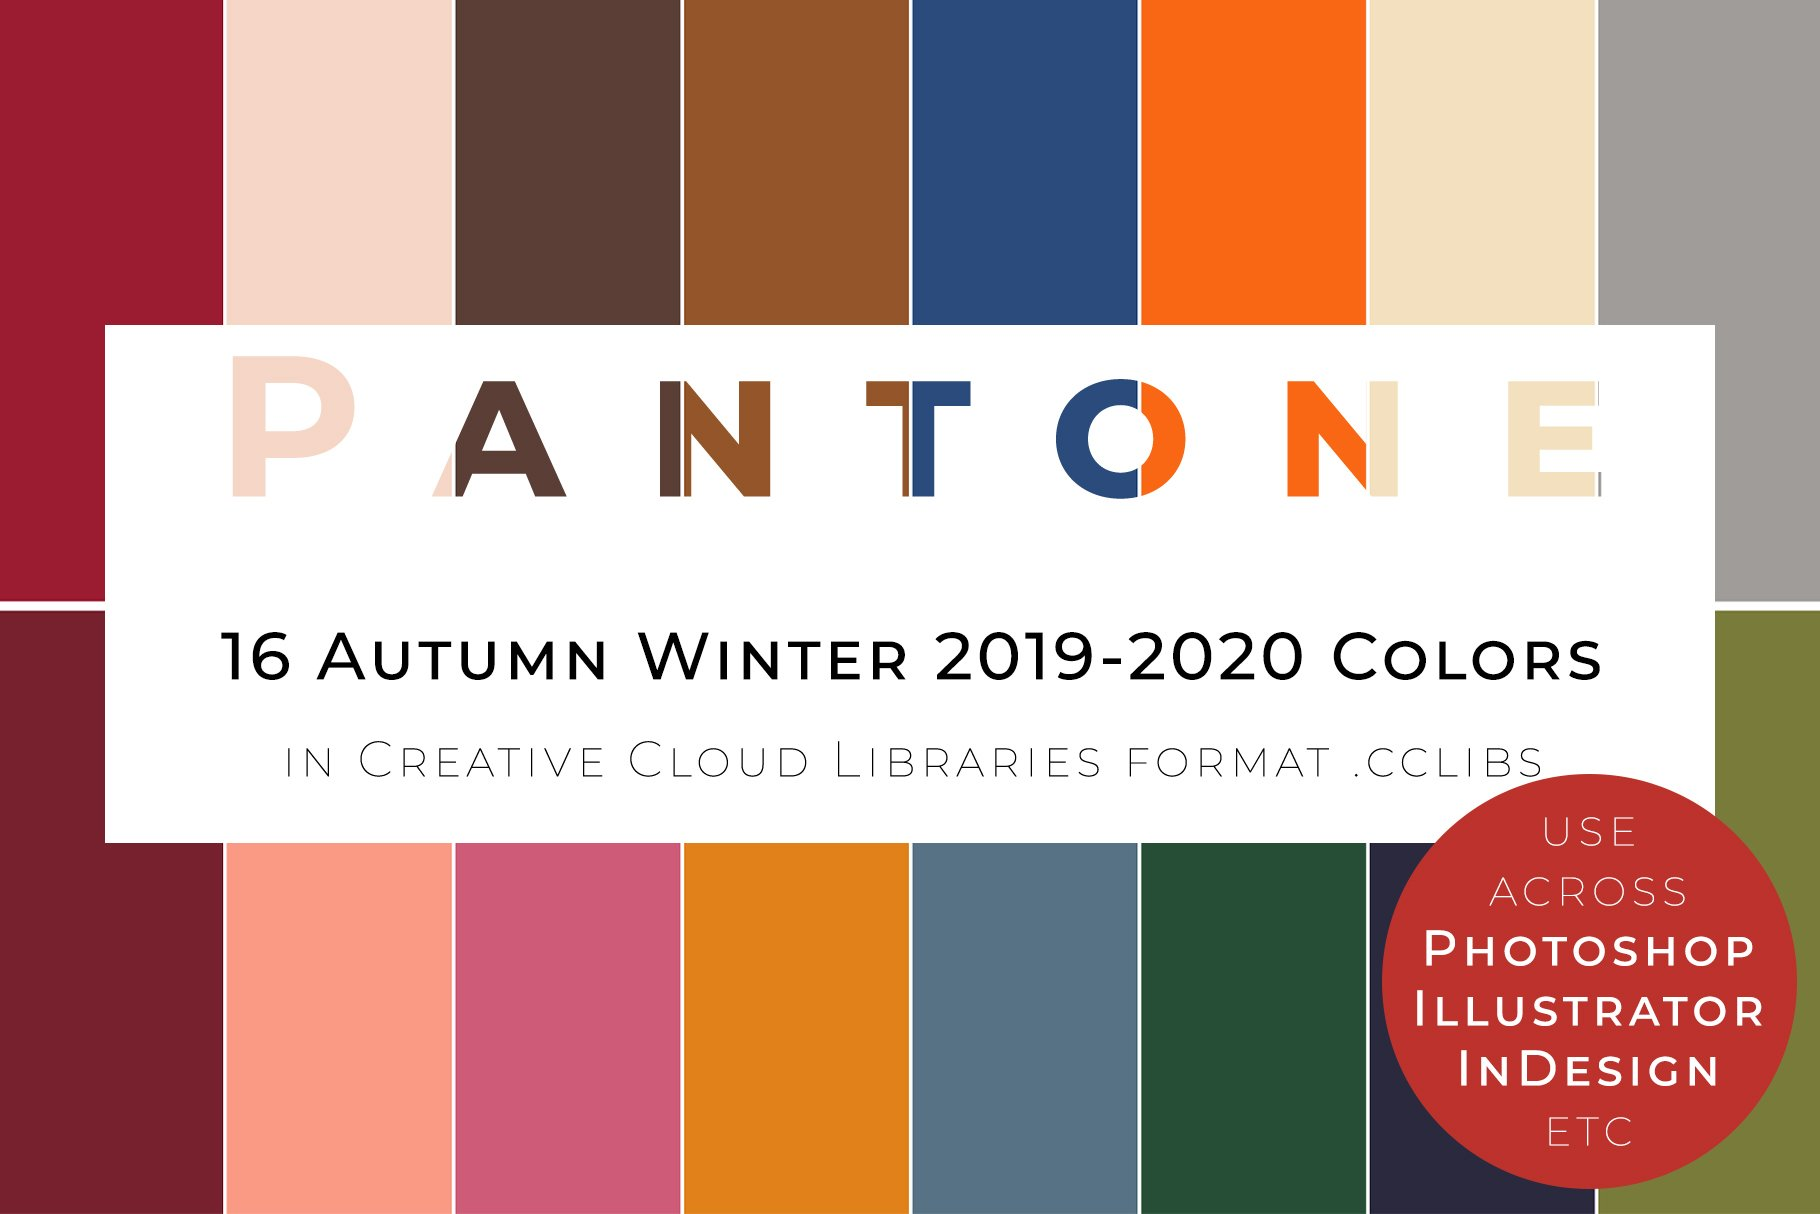 16 iPantonei AW 2020 20 palette Illustrator Add Ons